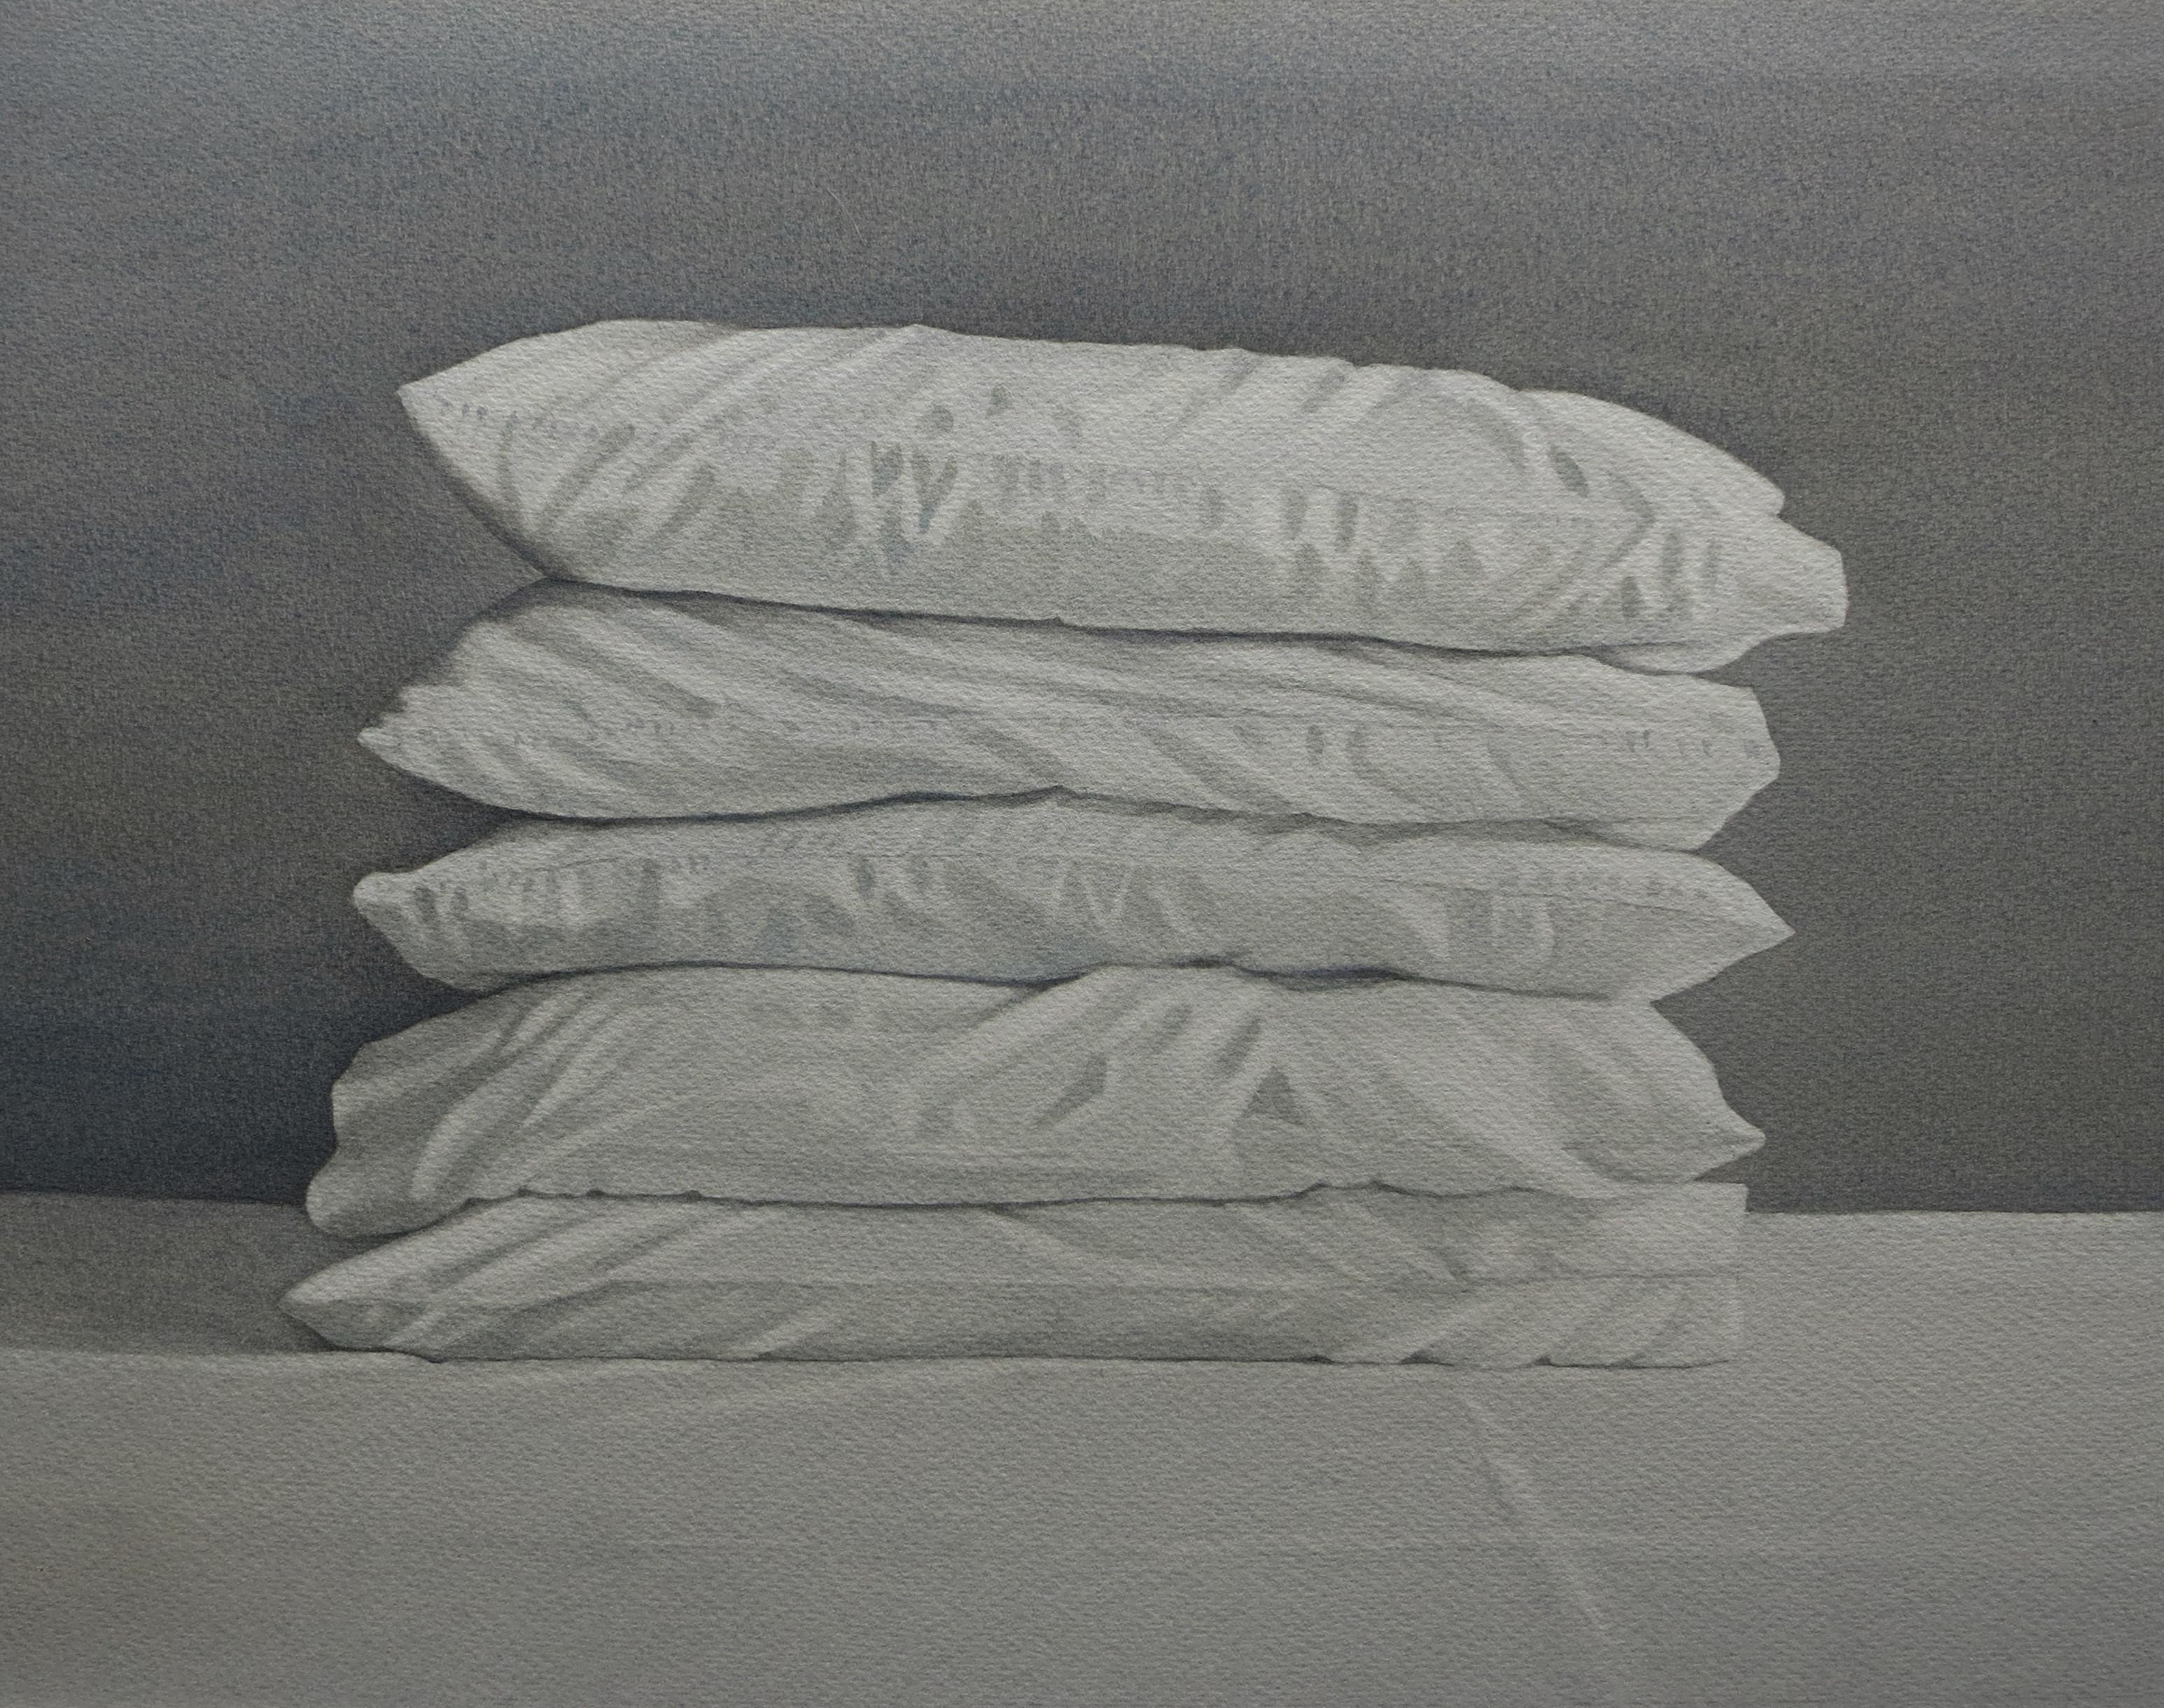 Pile of pillows 33 x 41.5cm watercolour by Lillias August©